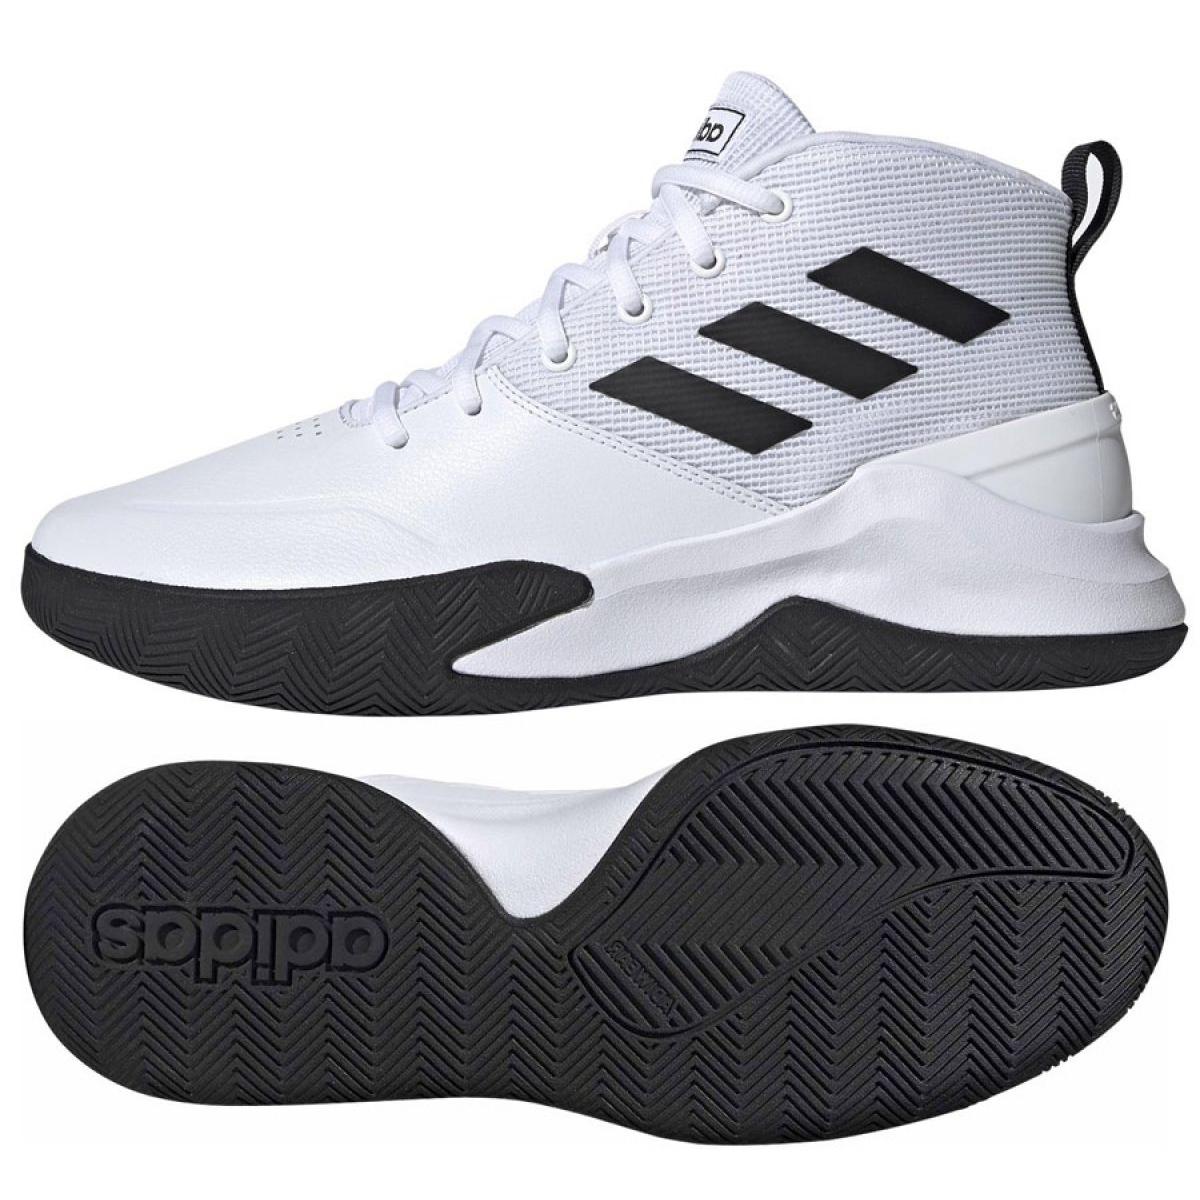 Kosárlabda cipő adidas Ownthegame M EE9631 fehér fehér